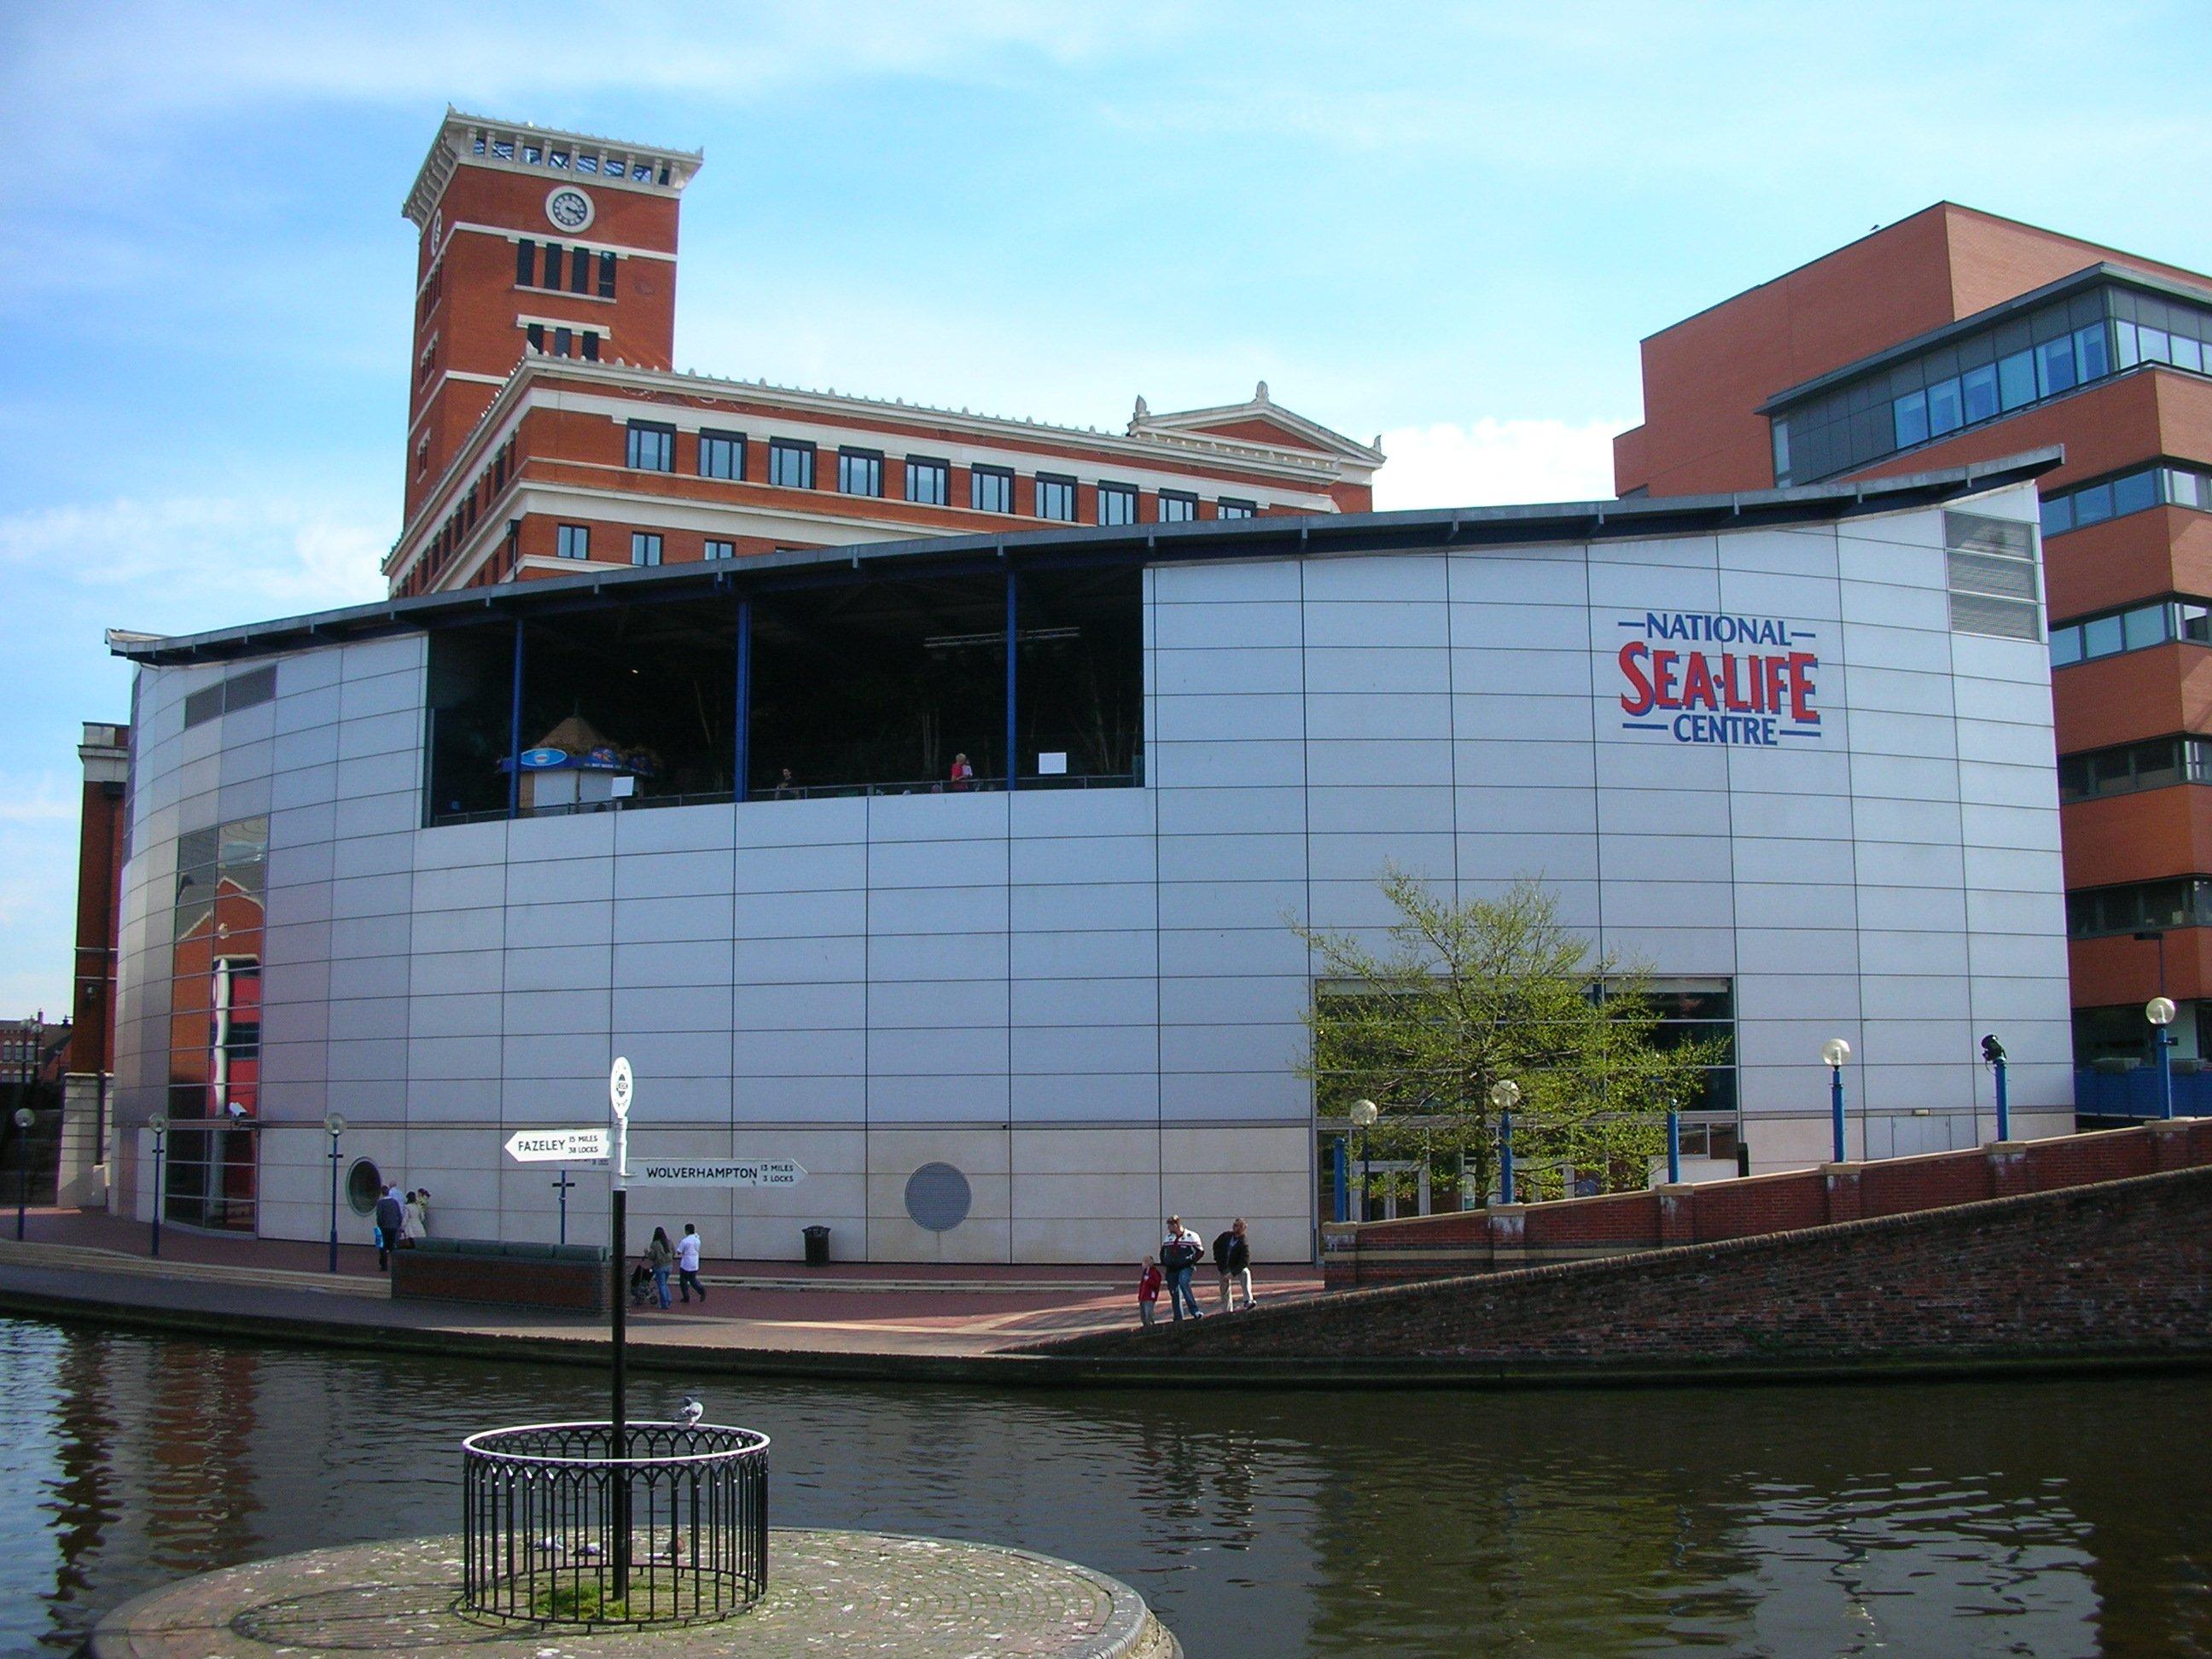 Description National Sea Life Centre and BCN canal, Birmingham.jpg